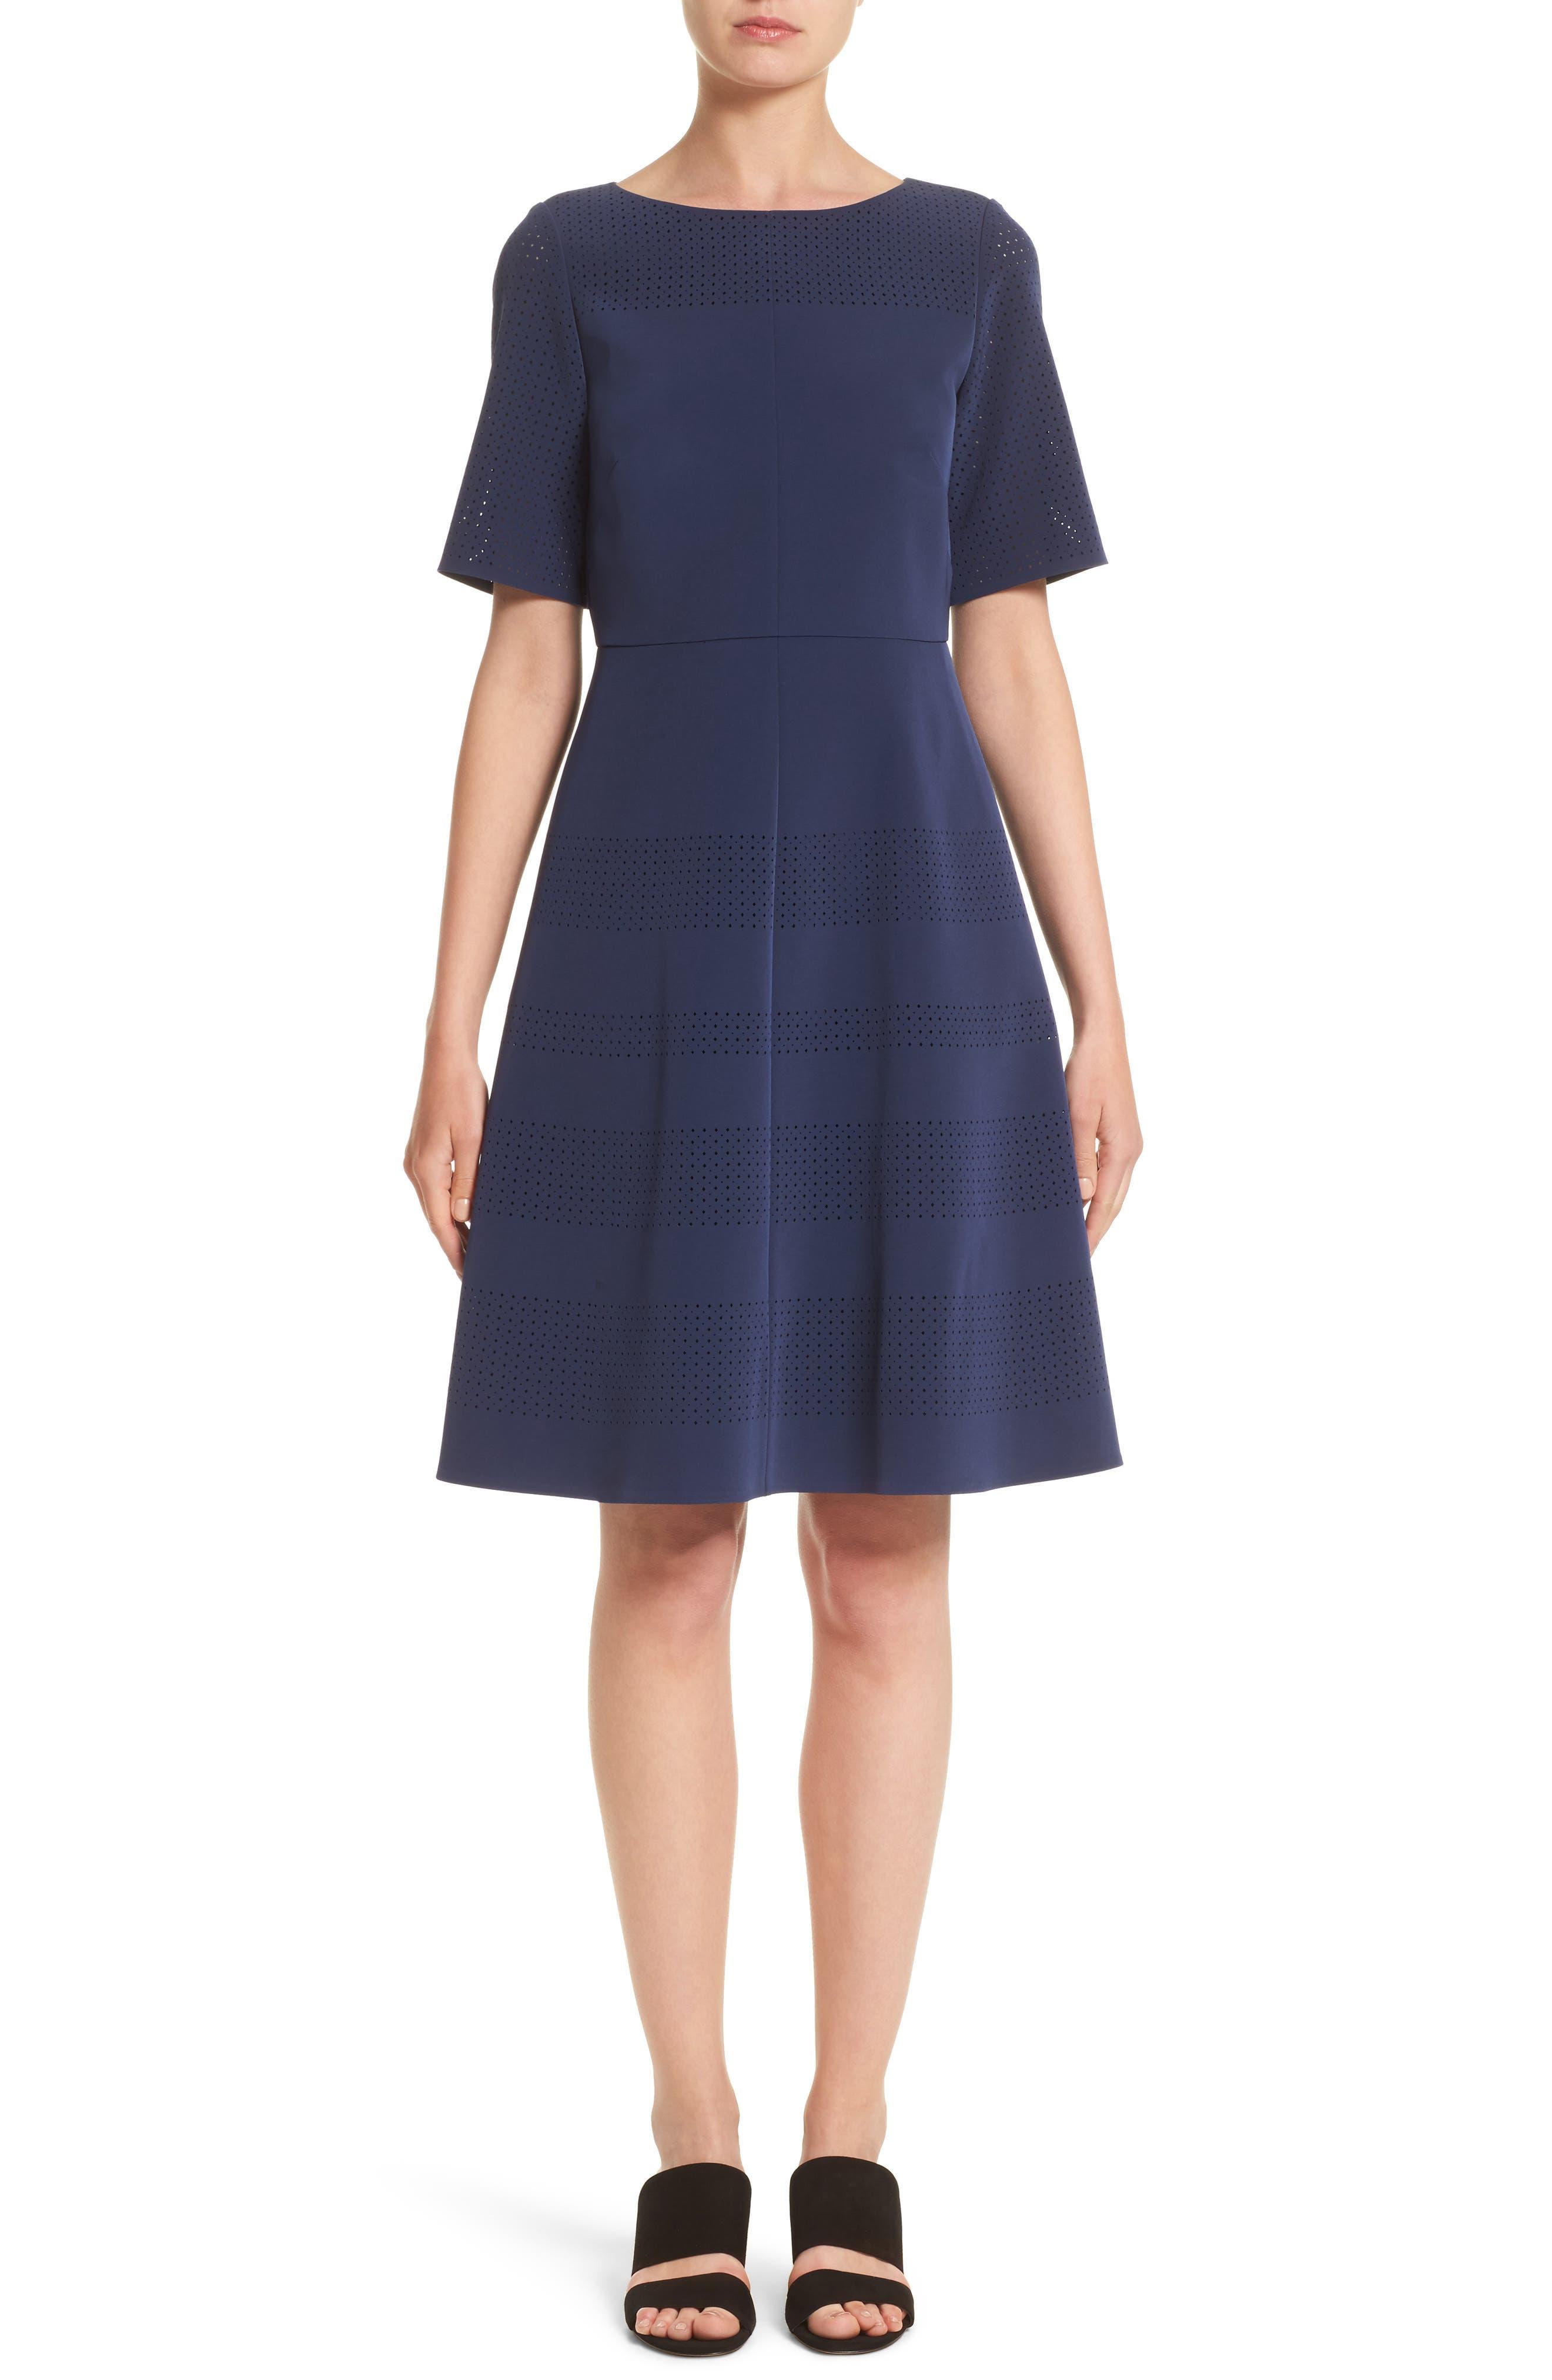 Main Image - Lafayette 148 New York Tamera Perforated Fit & Flare Dress